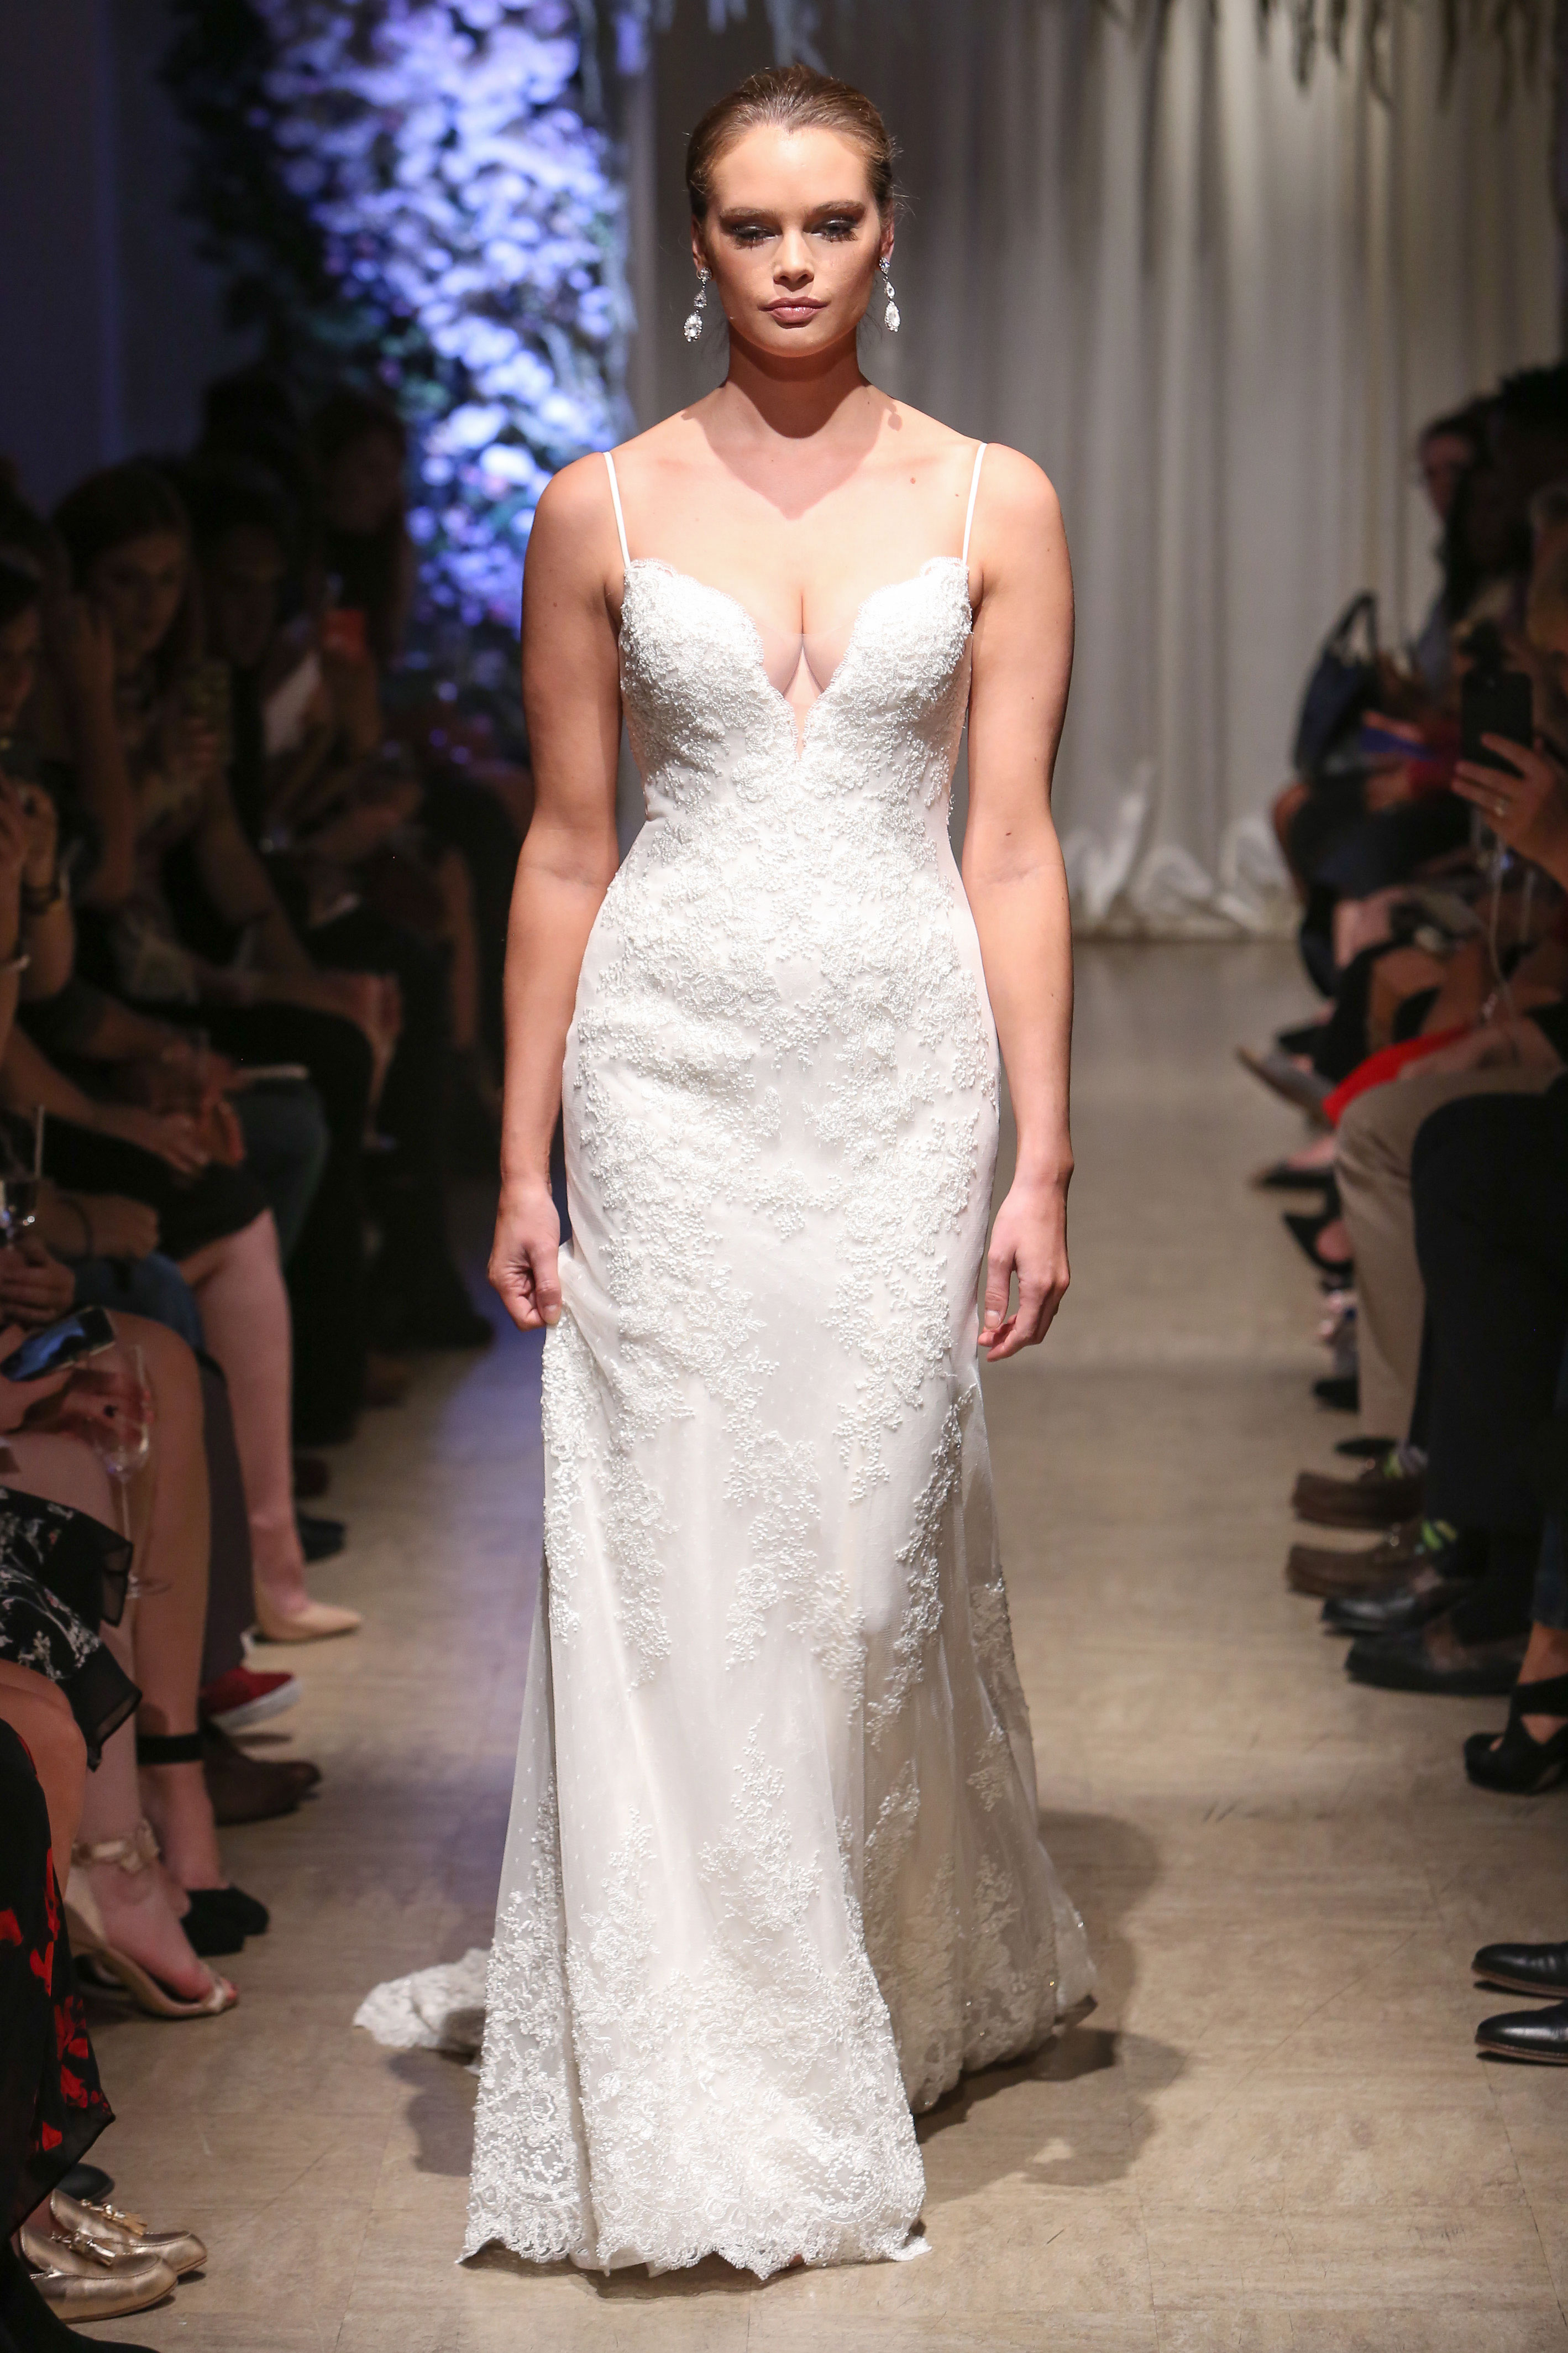 matthew christopher 2018 spaghetti strap plunging v-neck wedding dress